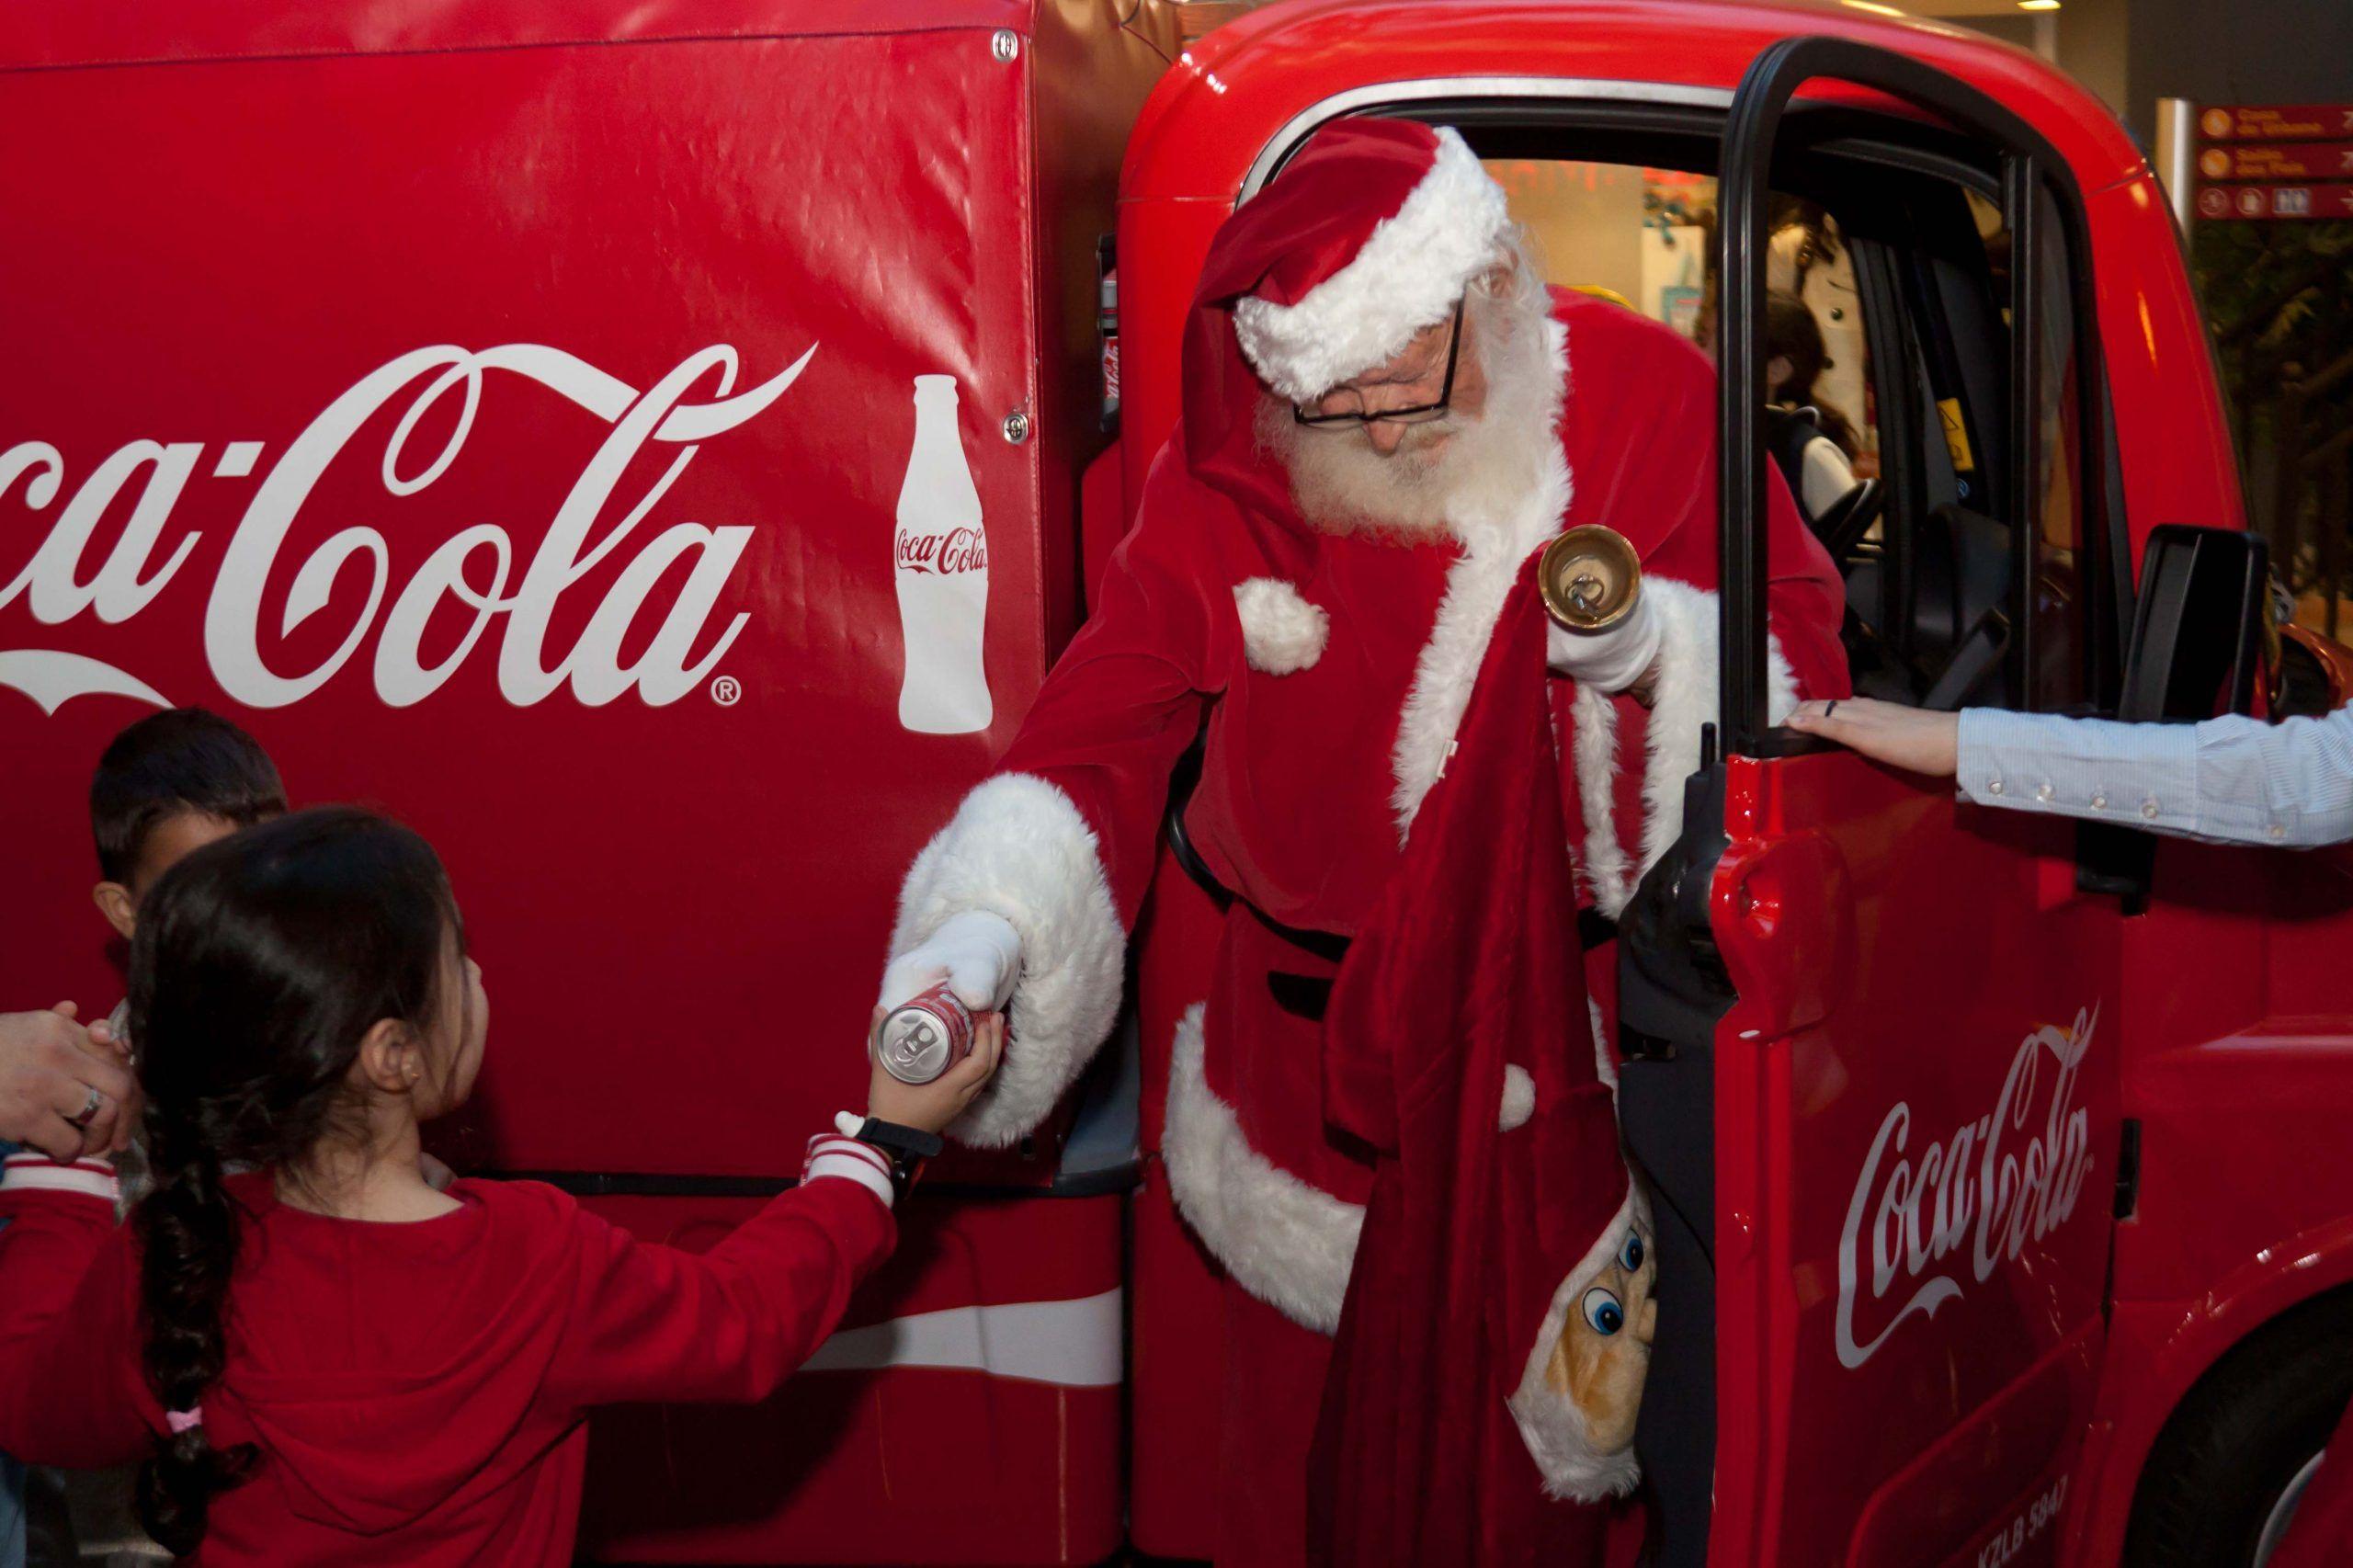 Coca_Cola_KIDZANIA_ 18-12-2011_Pedro Soares-231-46